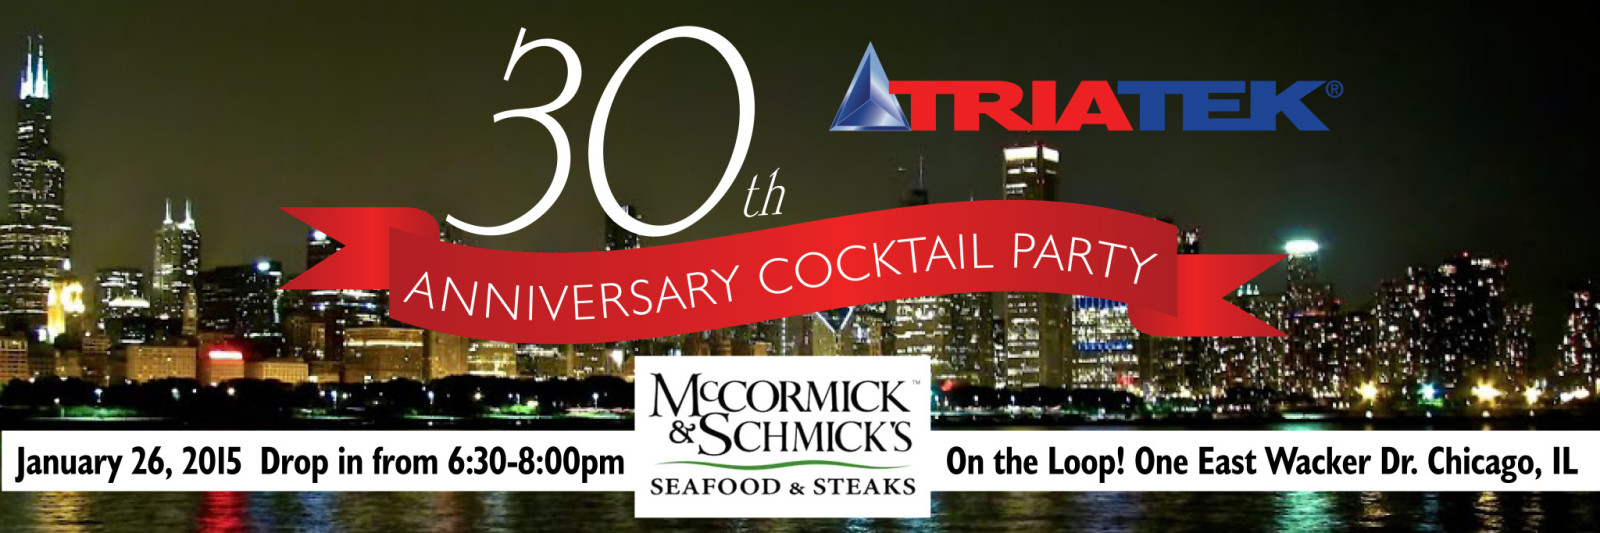 Triatek 30th Anniversary